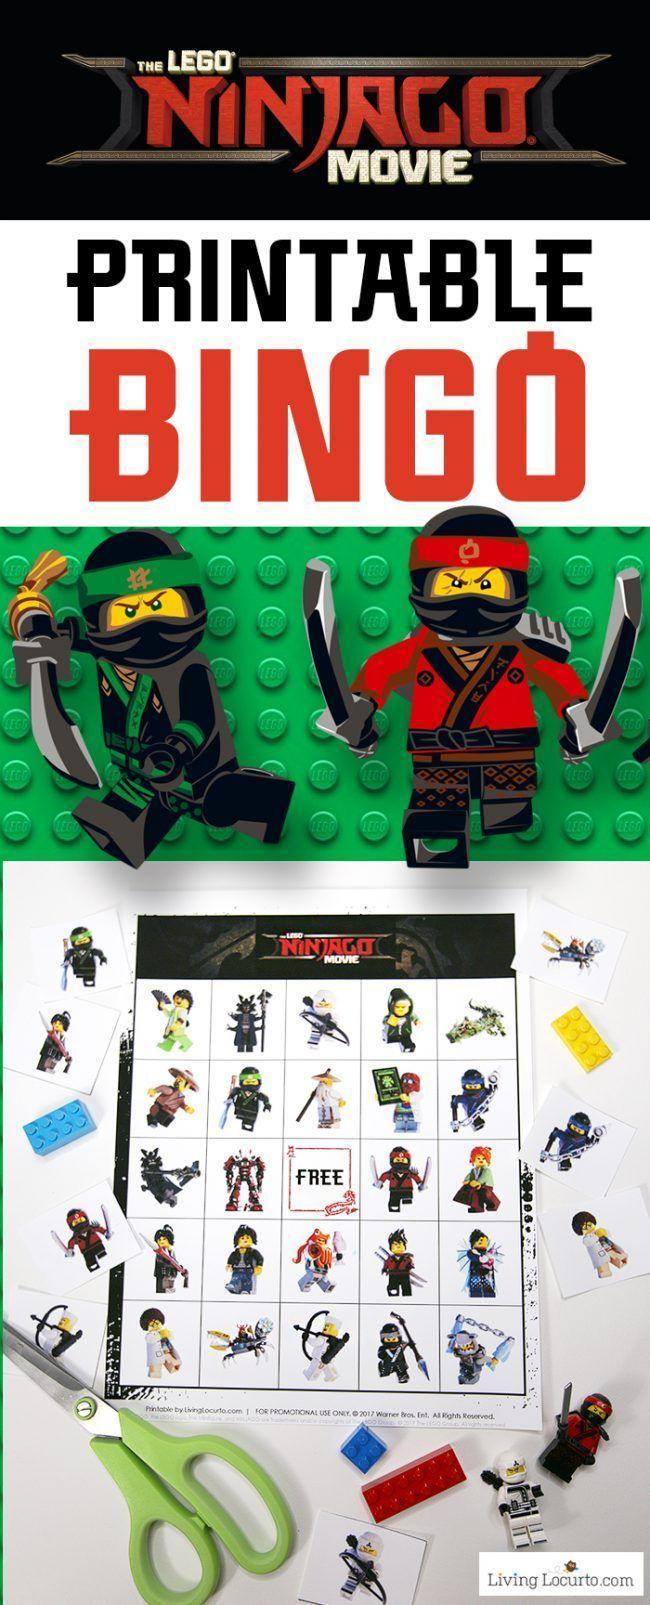 Lego Ninjago Movie Bingo - Lego Verjaardagsfeestje, Lego